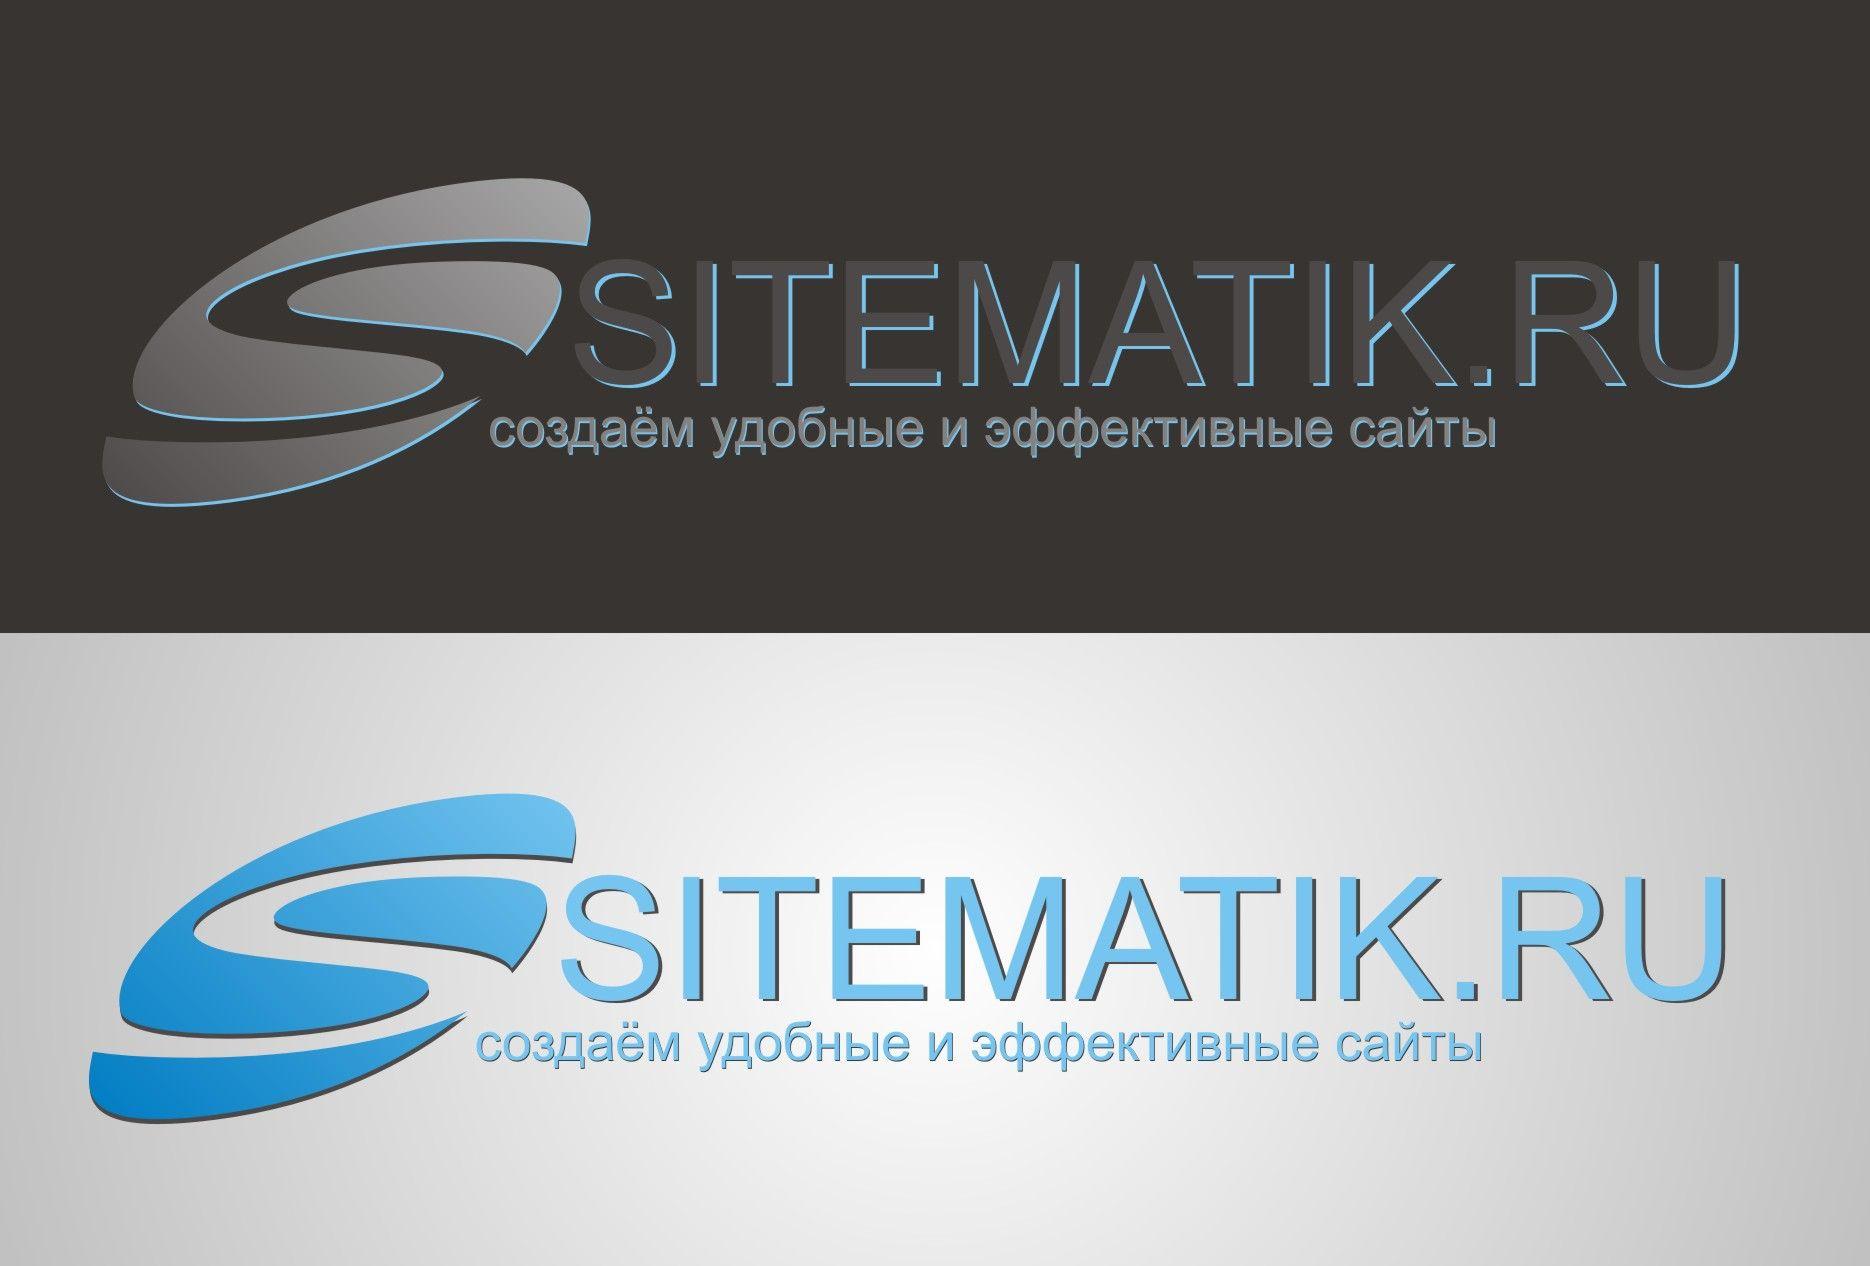 Логотип для Веб-студии - дизайнер Nedowo